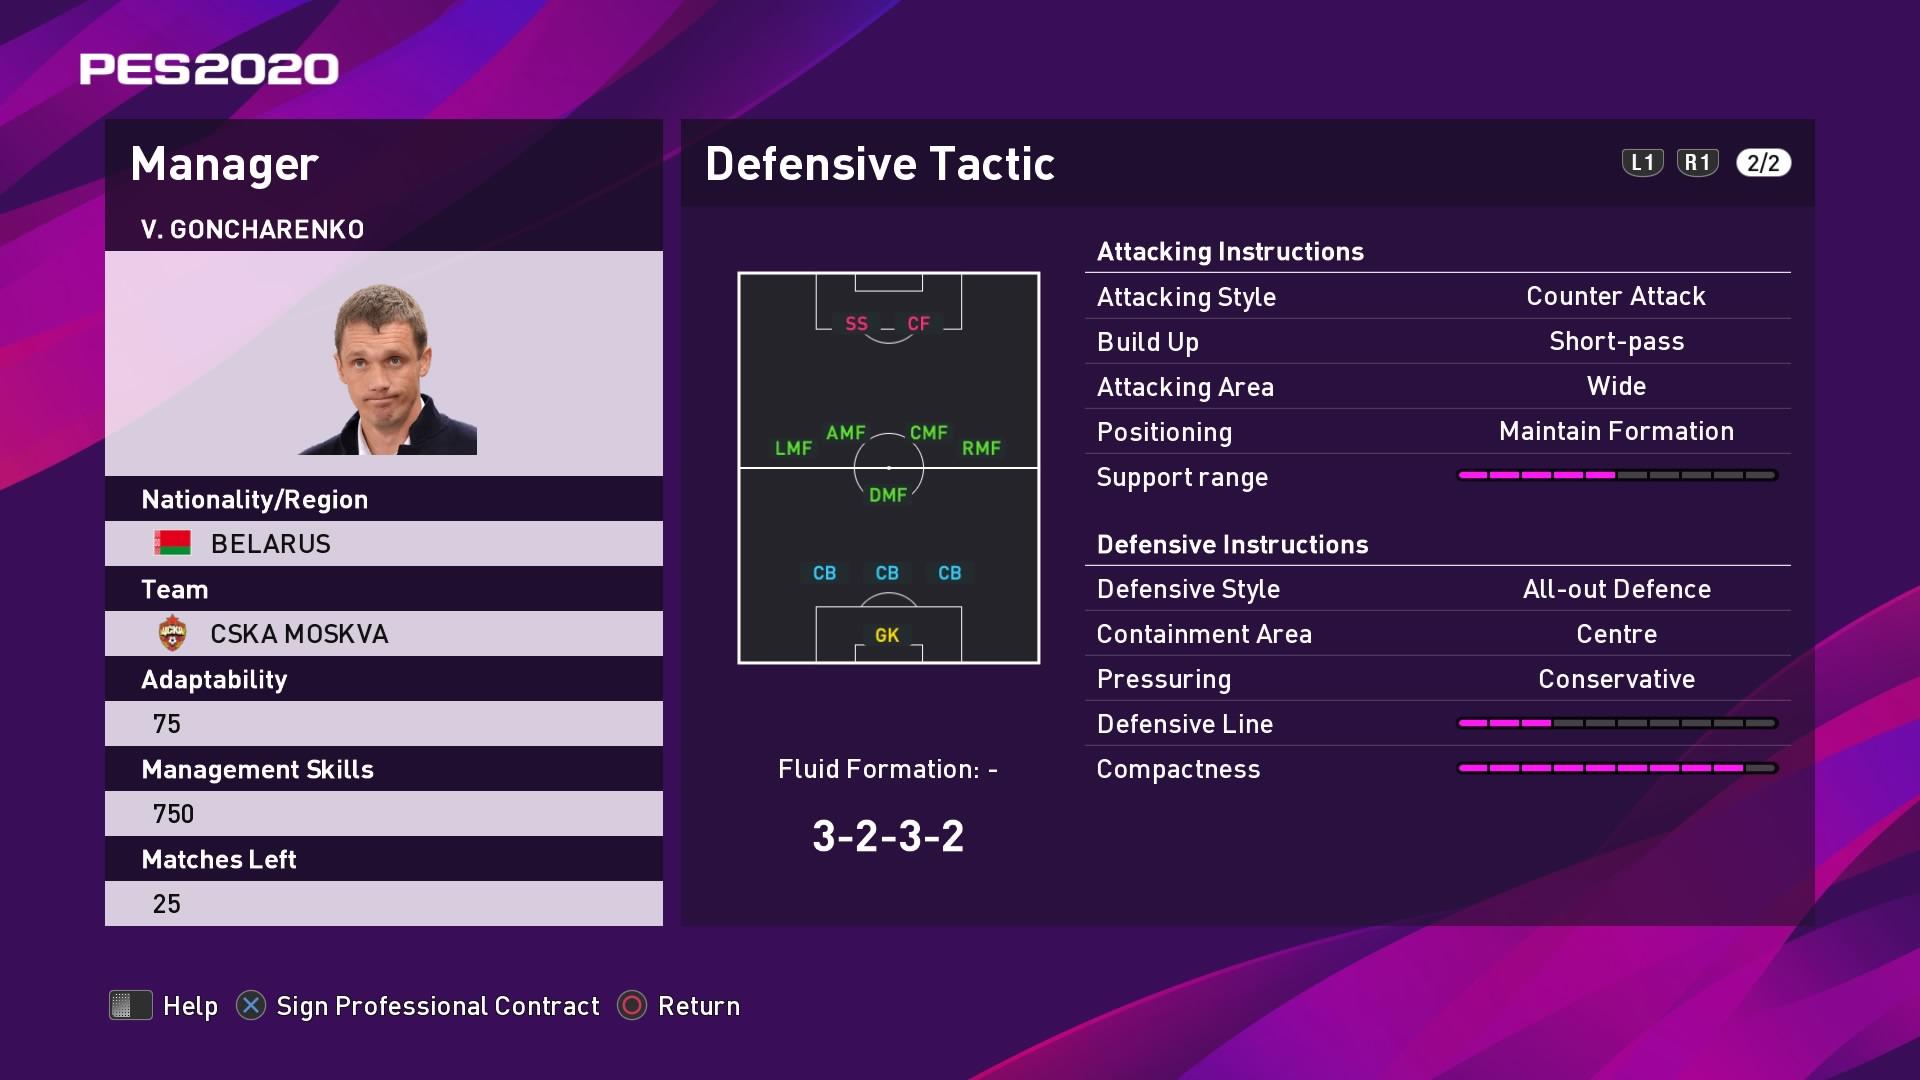 V. Goncharenko (Viktor Goncharenko) Defensive Tactic in PES 2020 myClub